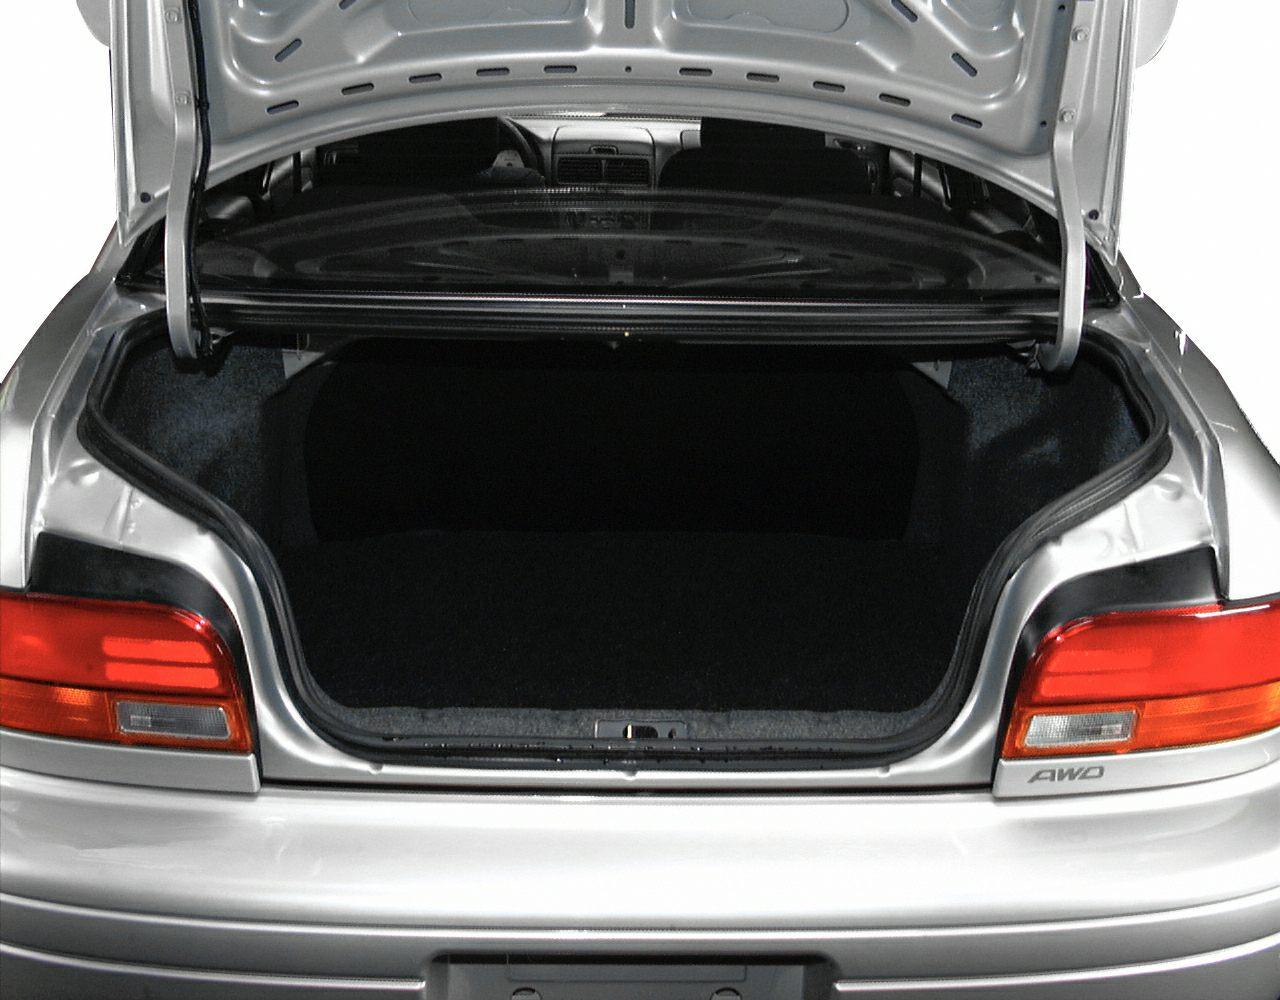 2000 Subaru Impreza Exterior Photo